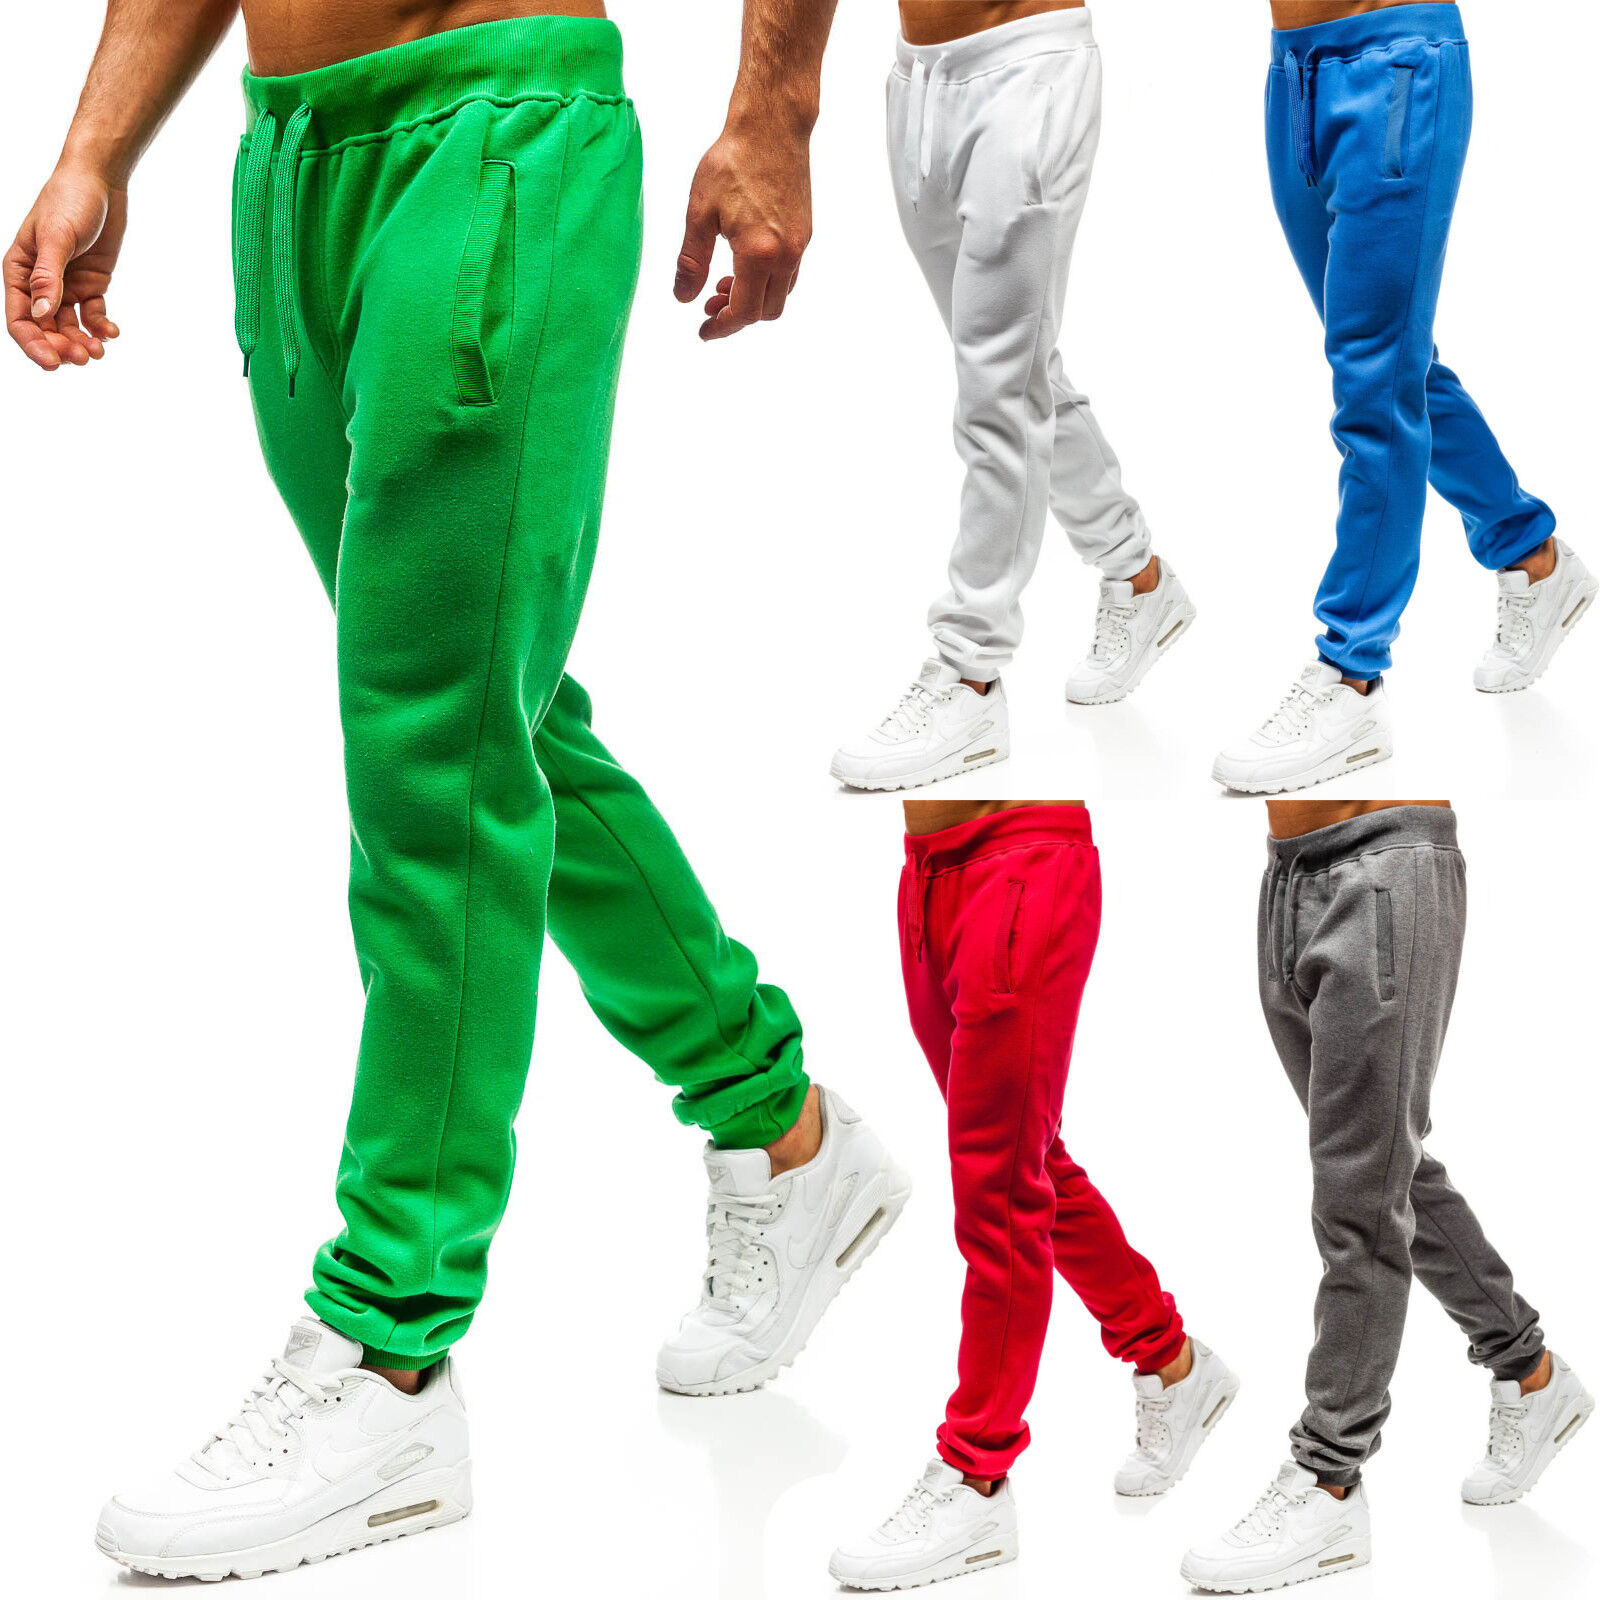 ef601f37038192 BOLF Trainingshose Sporthose Fitness Jogginghose Basic Sport Herren 6F6  Slim Fit